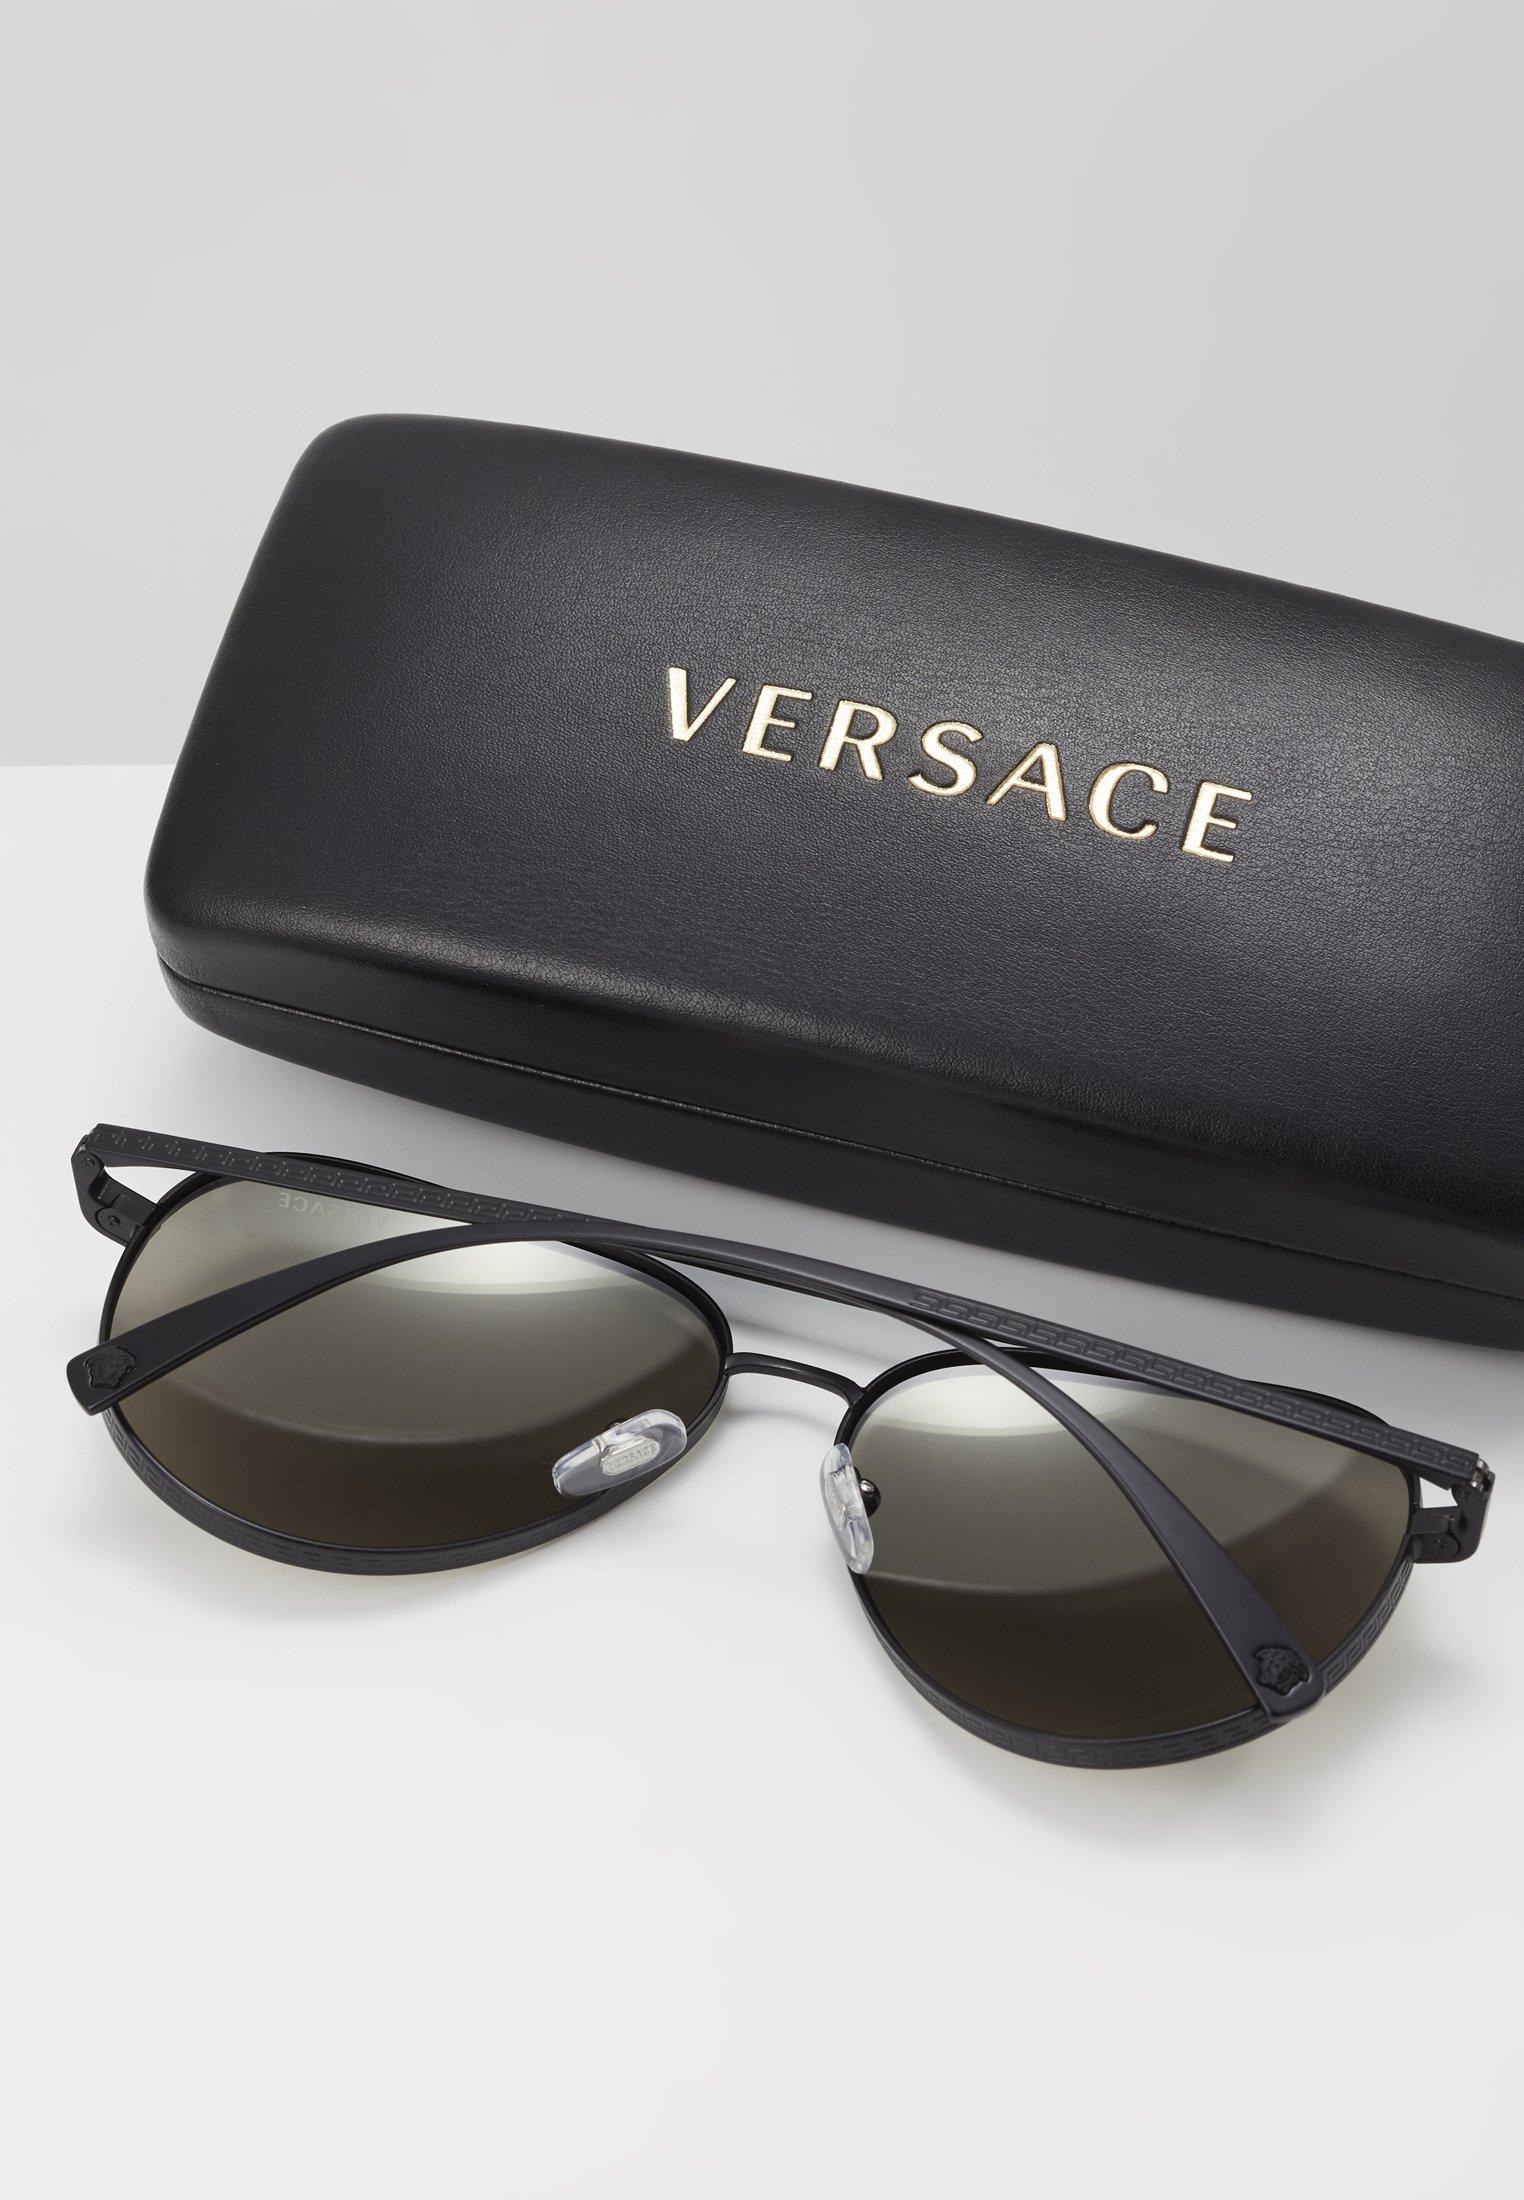 Versace Solbriller - matte black/svart Z4Nqjf5pAKvjtS1